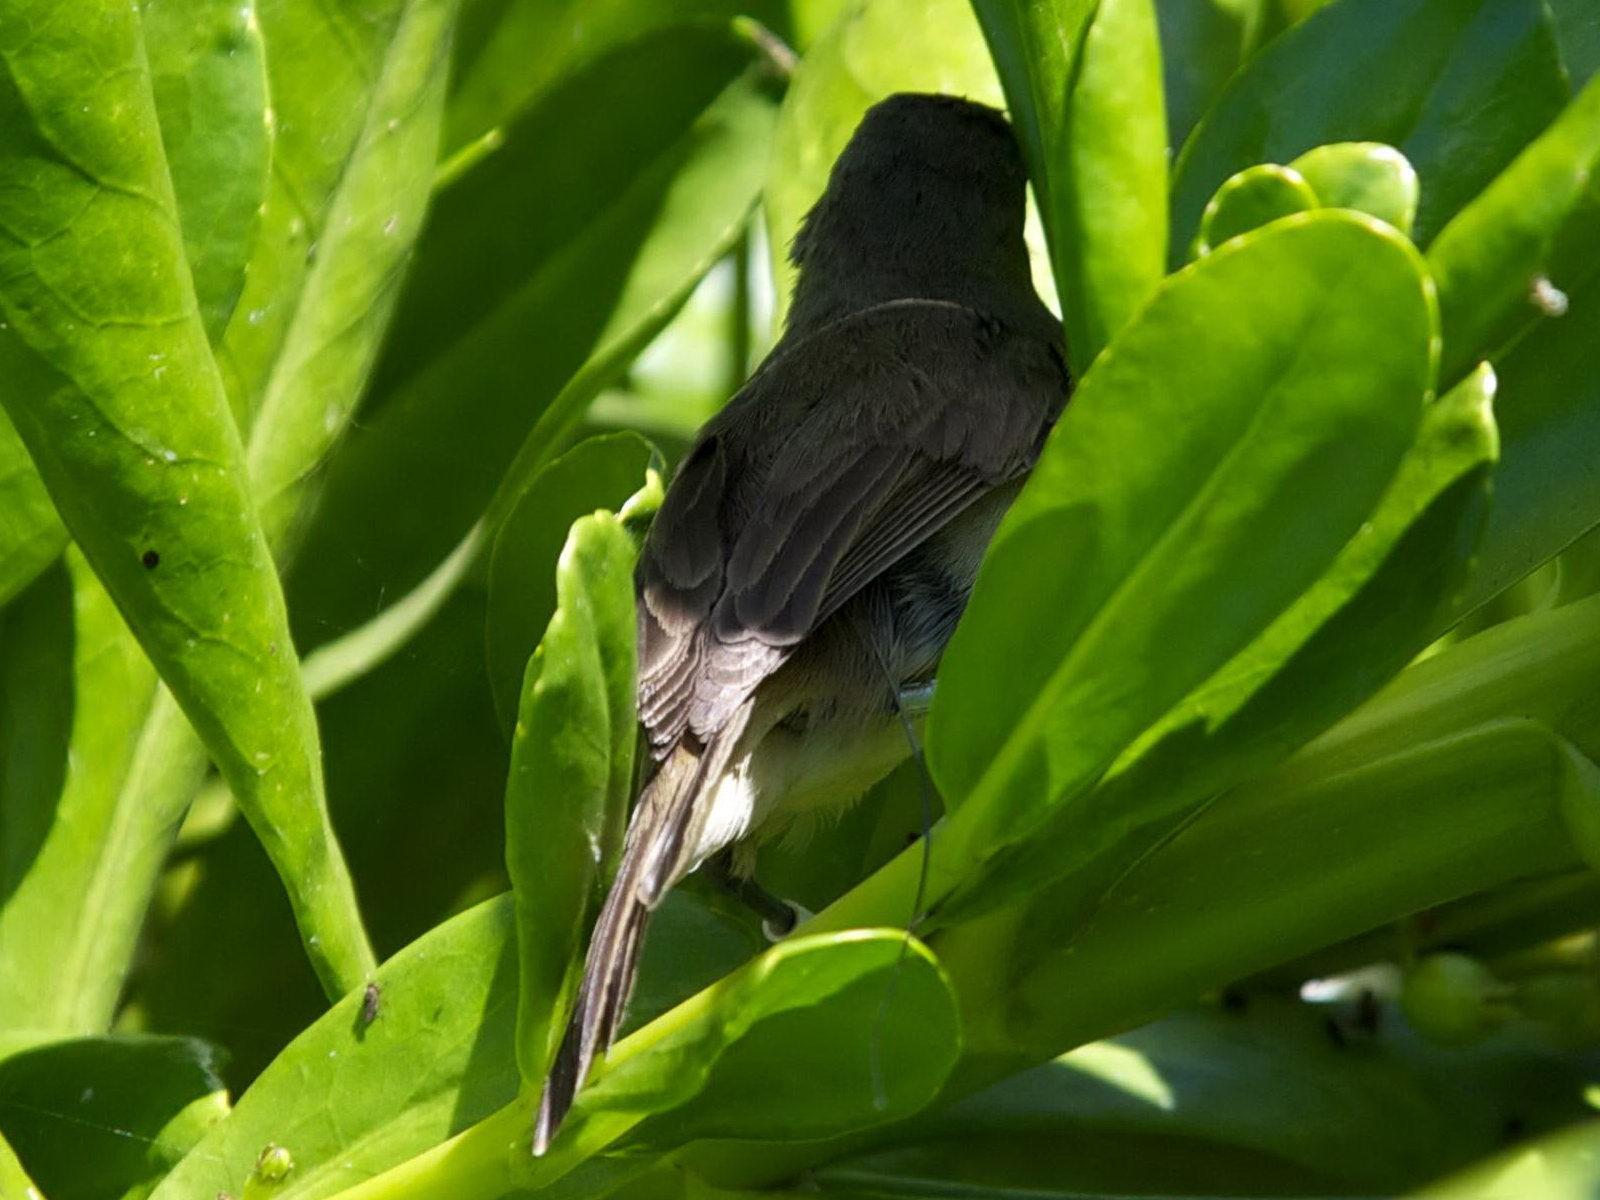 Free photograph; small, bird, big, green, leaves